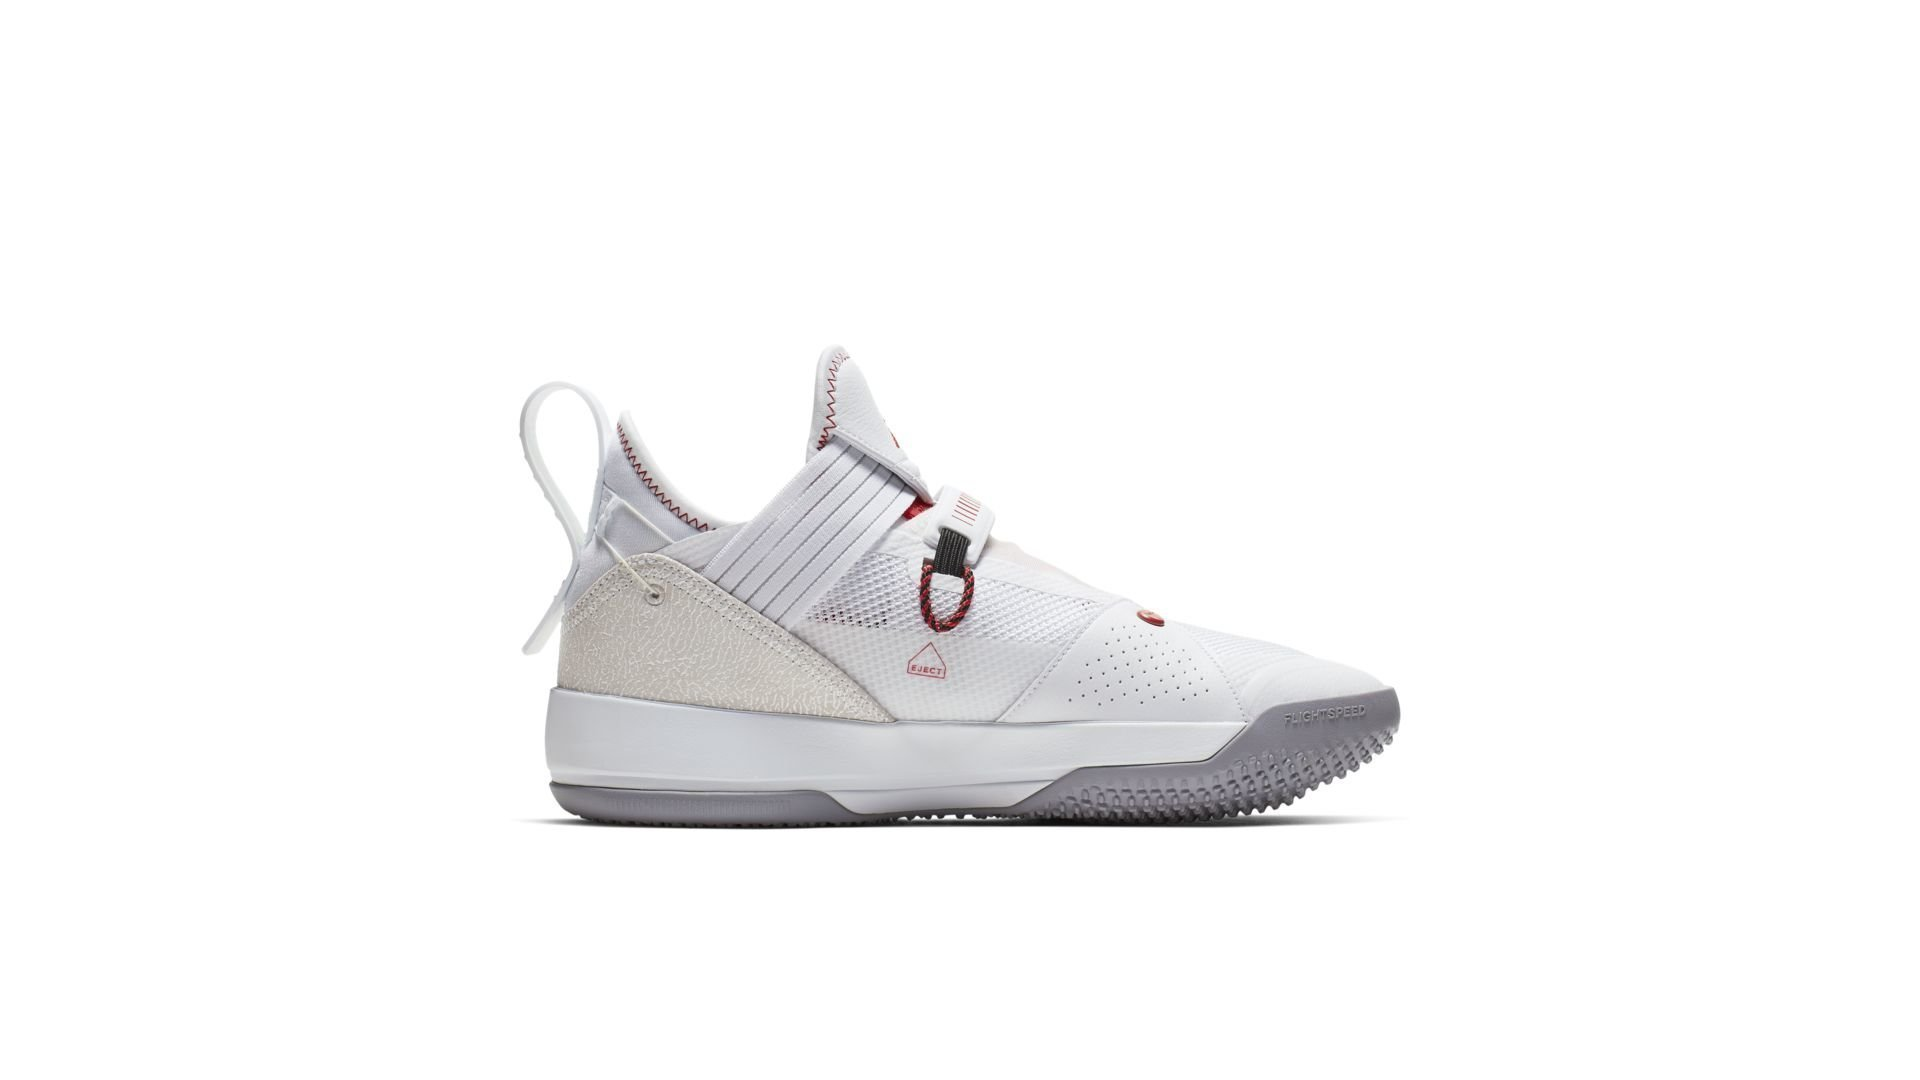 Jordan XXXIII SE White Gym Red Black (CD9560-106)